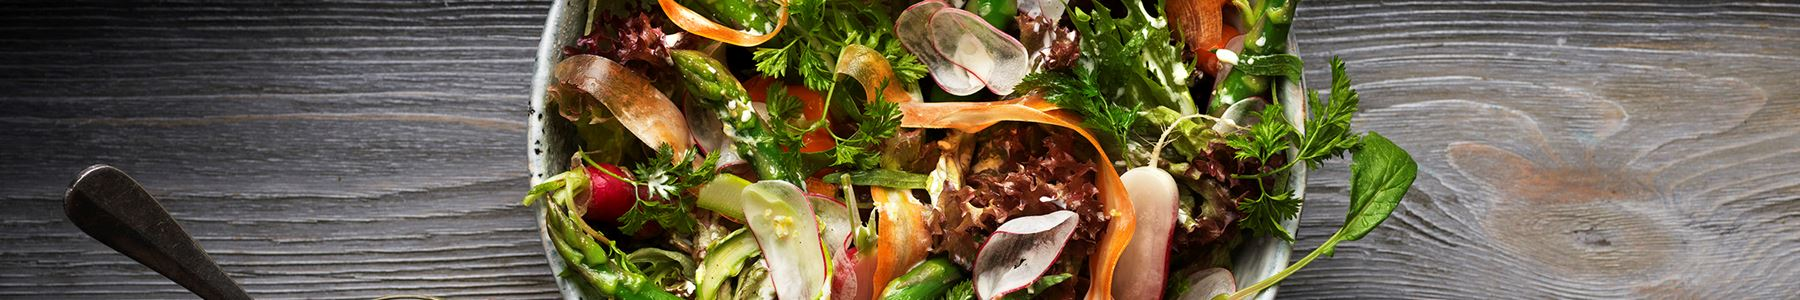 Morötter + Sparris + Sallad